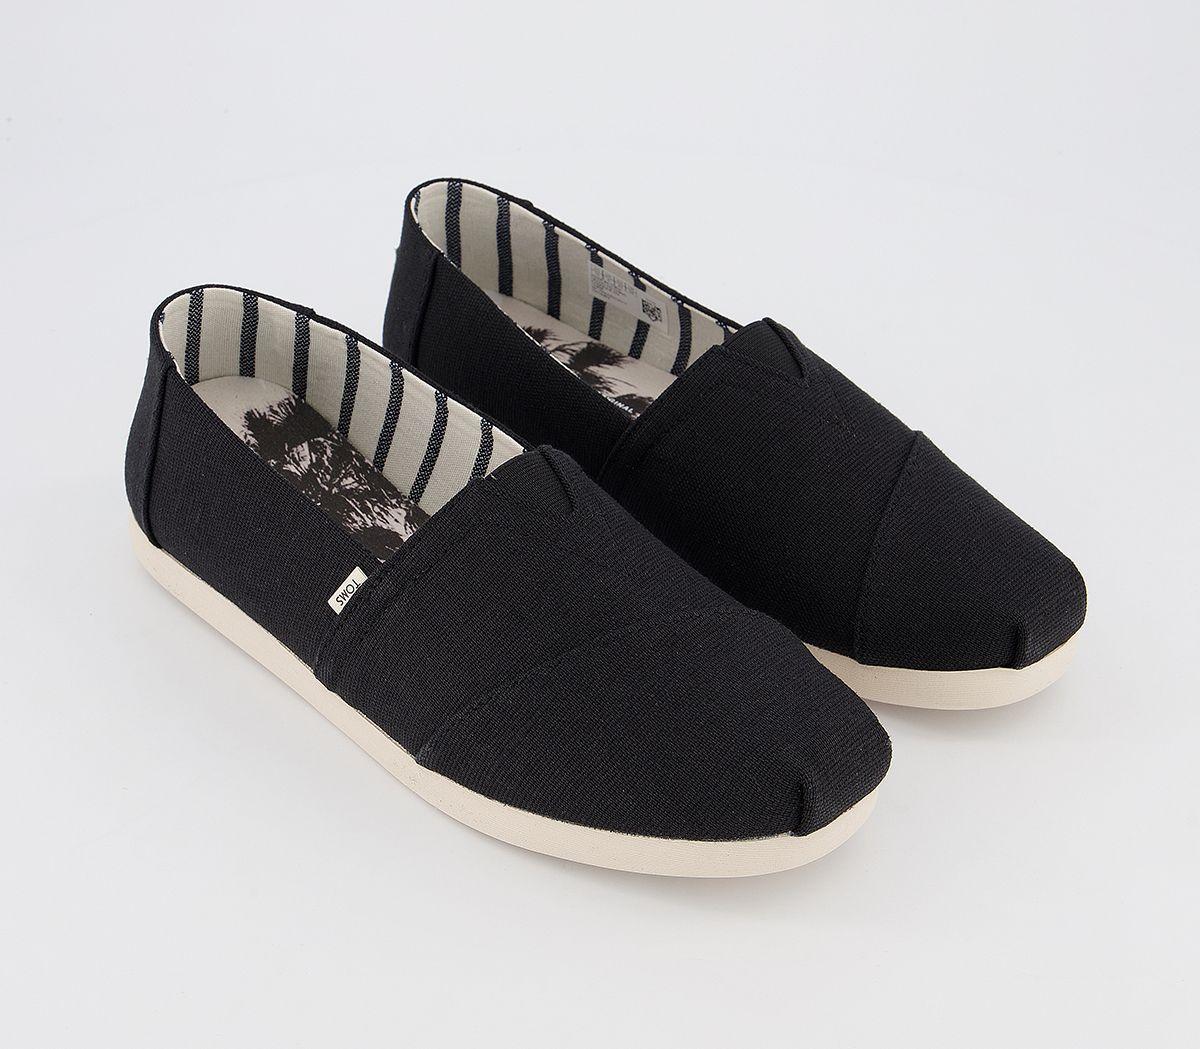 Da-Uomo-Toms-Toms-Classic-Alpargata-SLIP-ONS-BLACK-Heritage-Tela-Scarpe-Casual miniatura 7